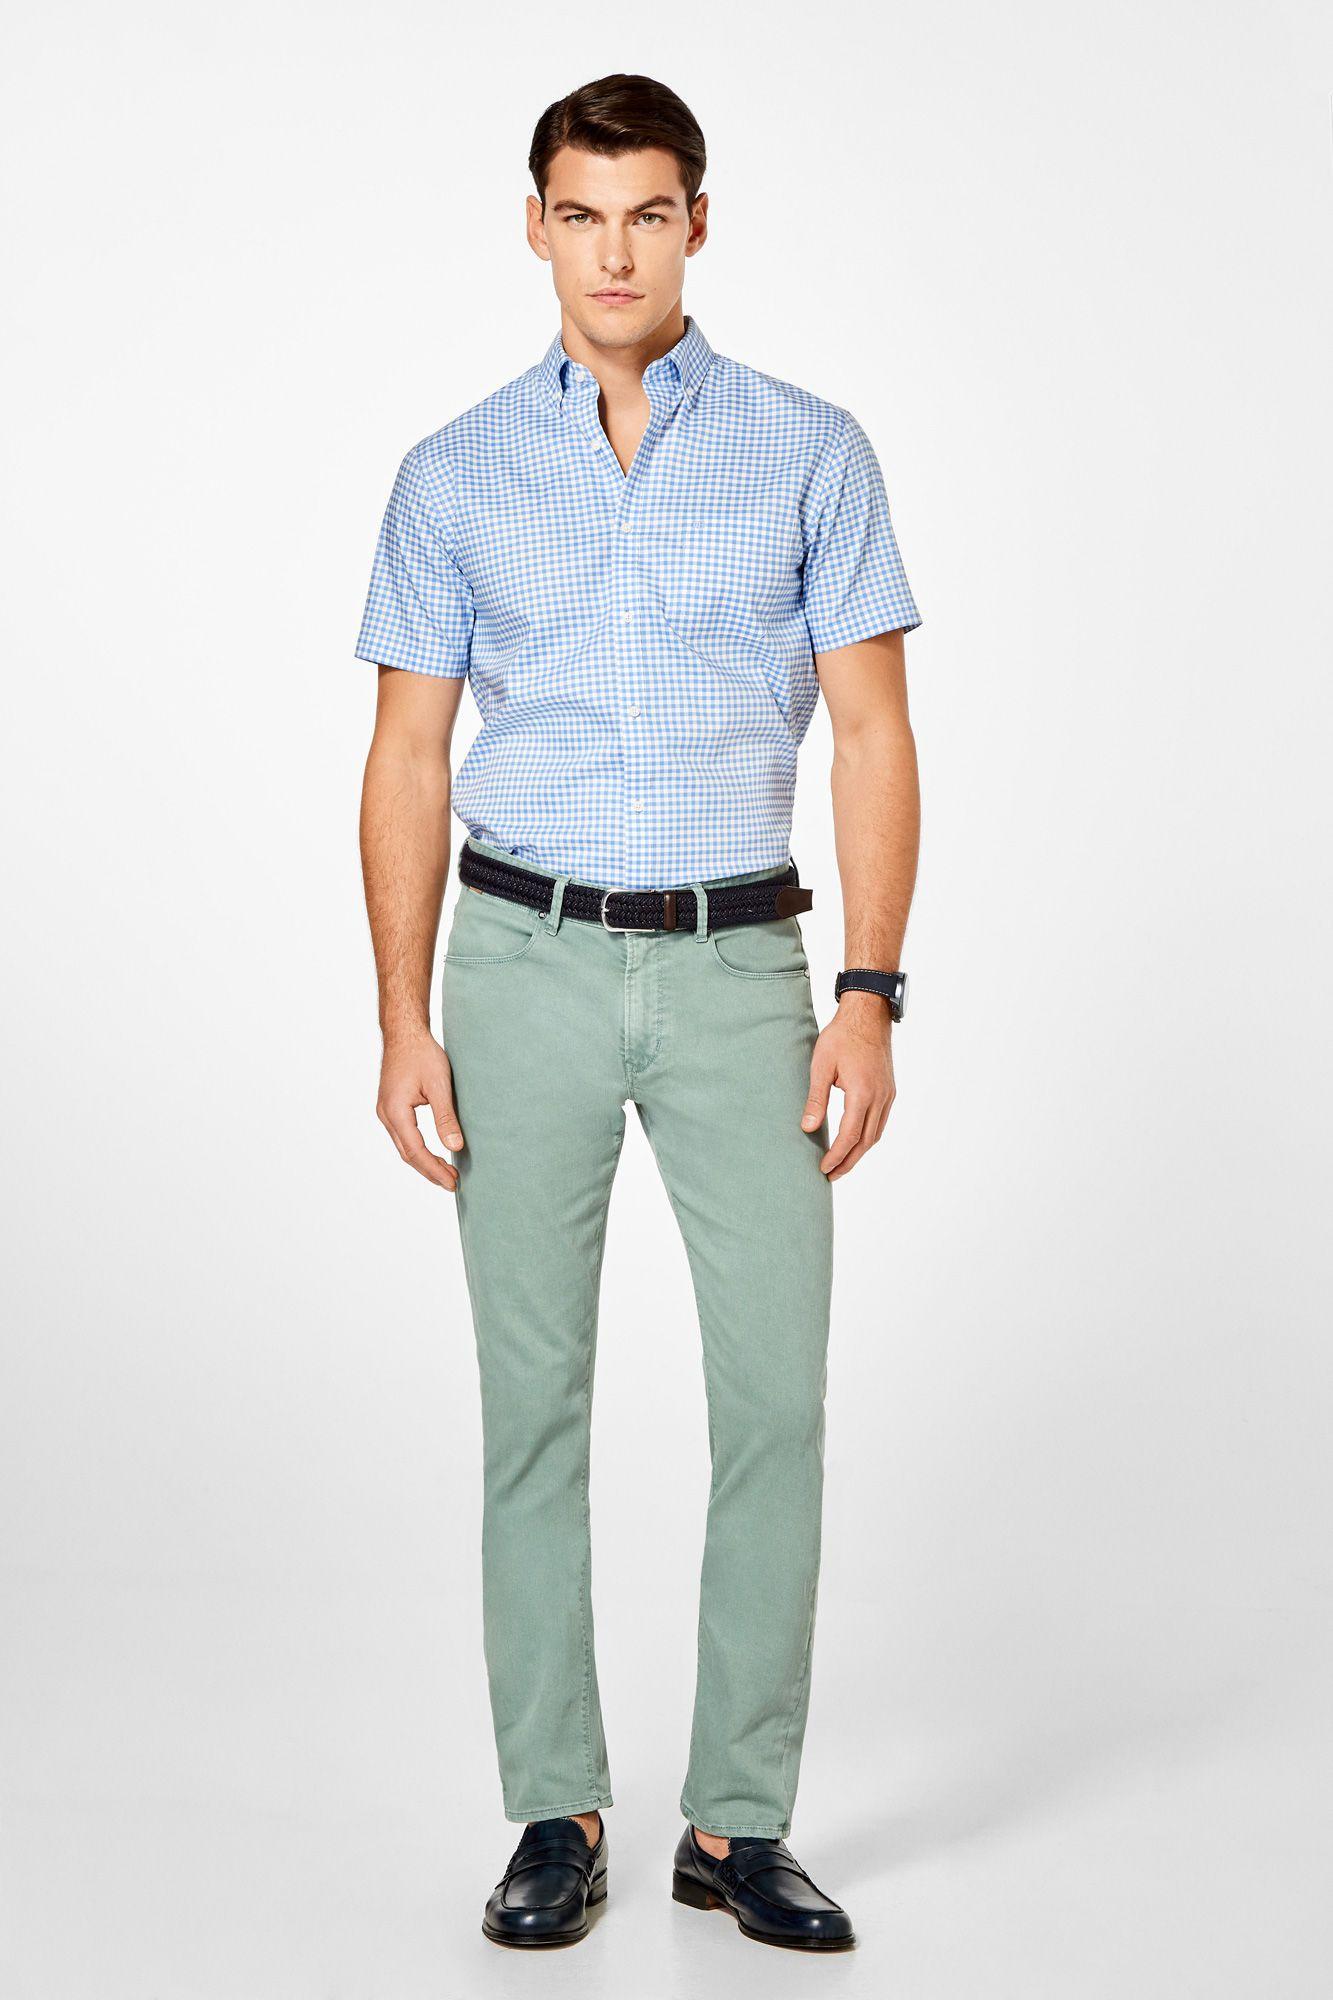 16b78cca0 Pedro del Hierro Camisa manga corta non-iron cuadros Azul